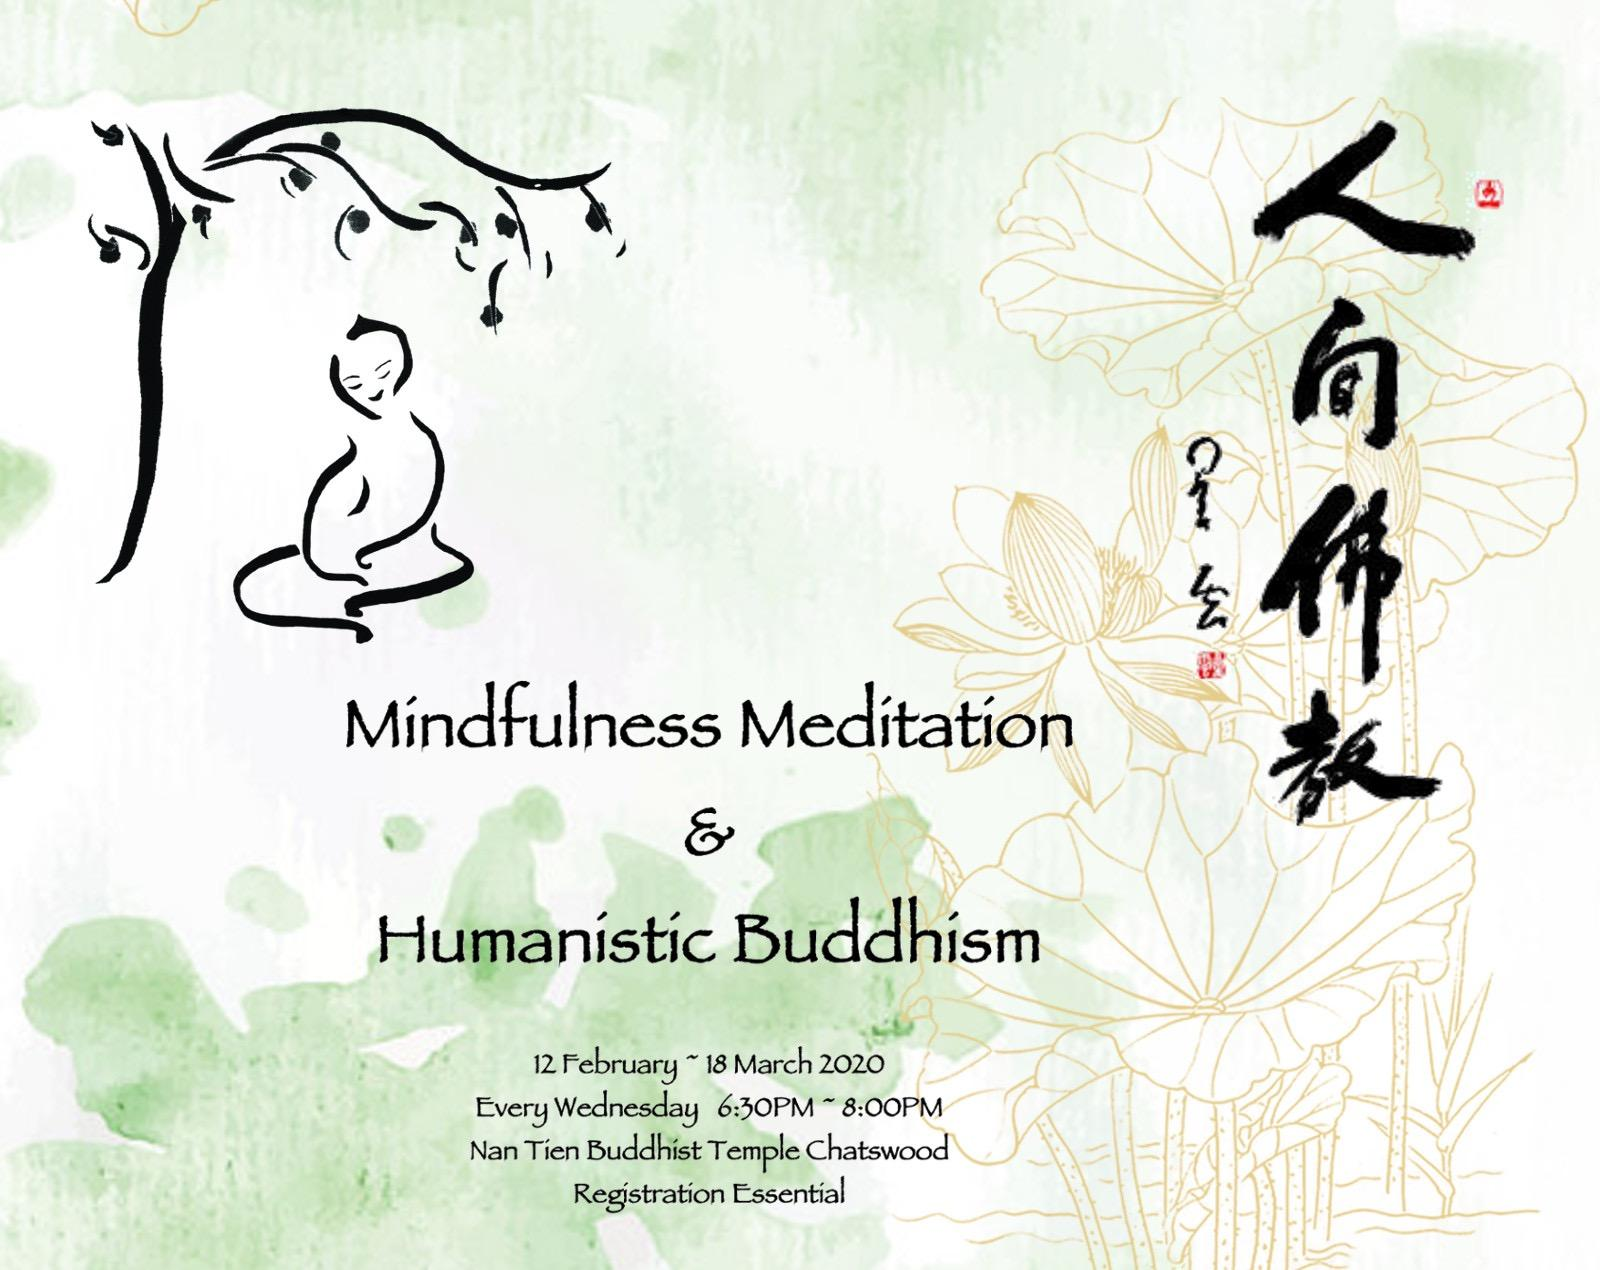 U3A-Meditation: Theory and Practice